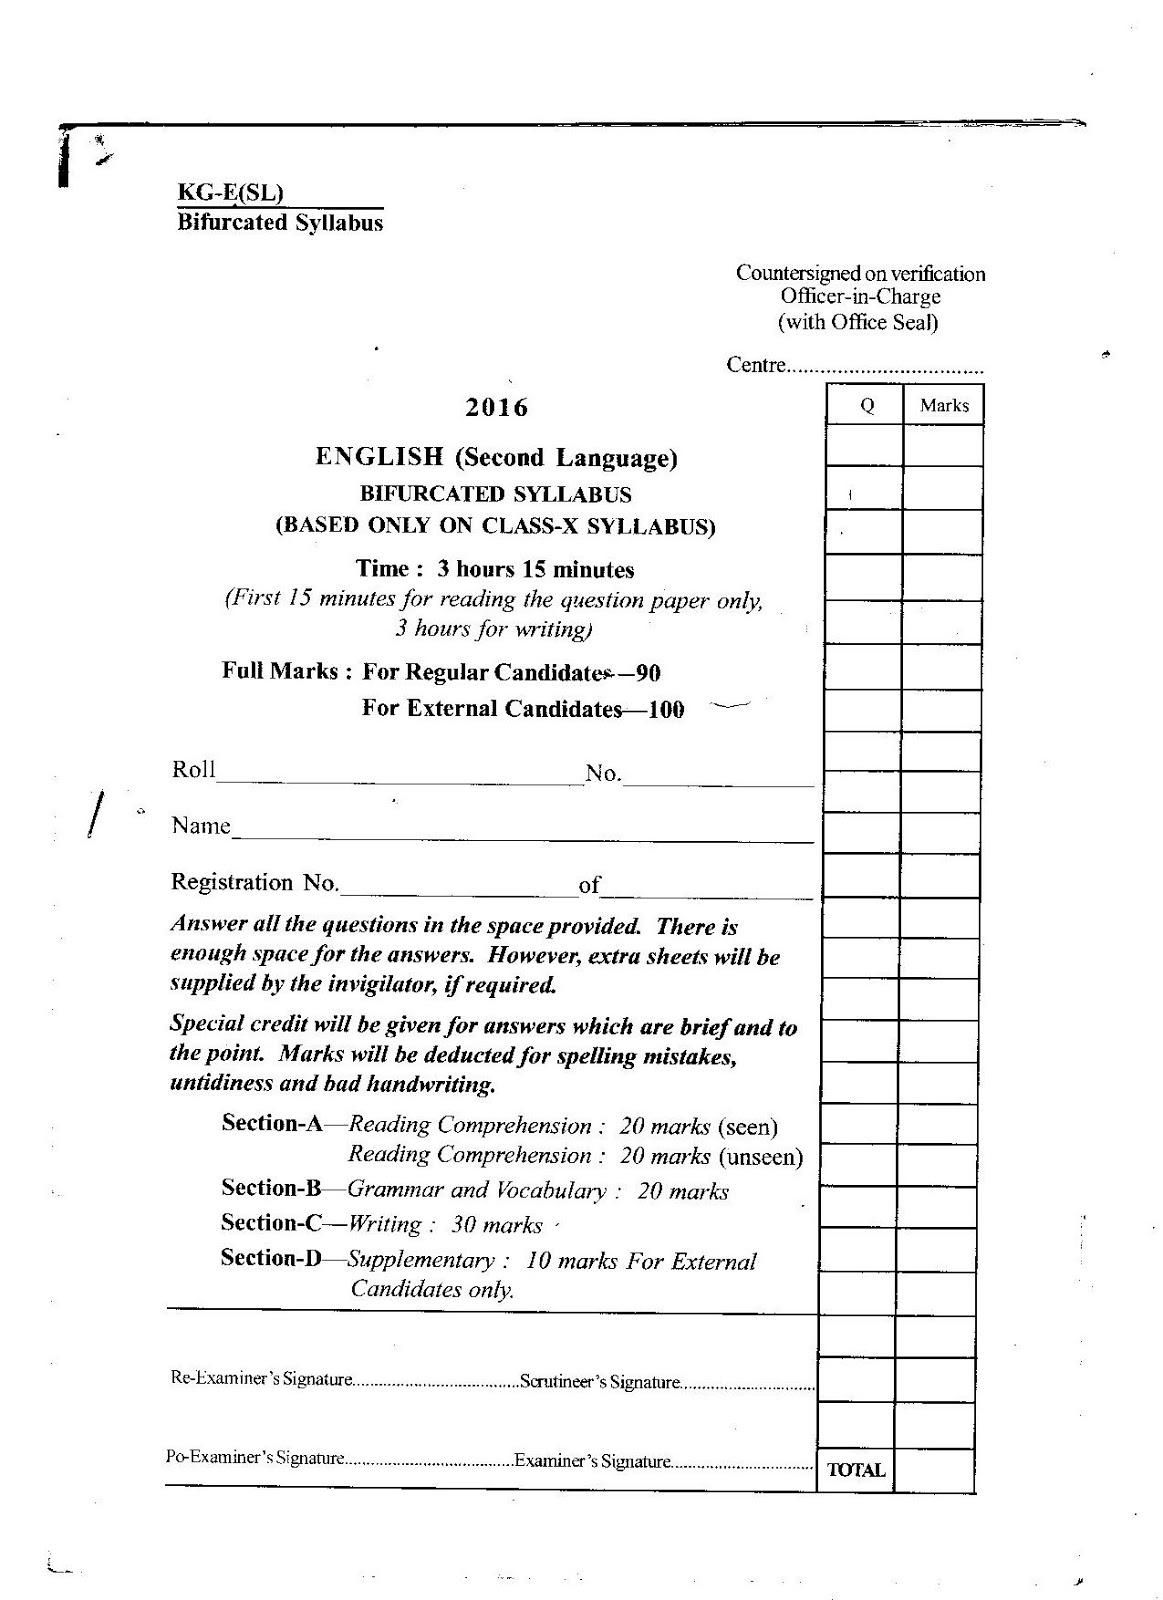 question paper Joint csir ugc net exam question papers & answer keys exam date,  question papers, answer keys june 2018, chemical sciences a b c earth  sciences.